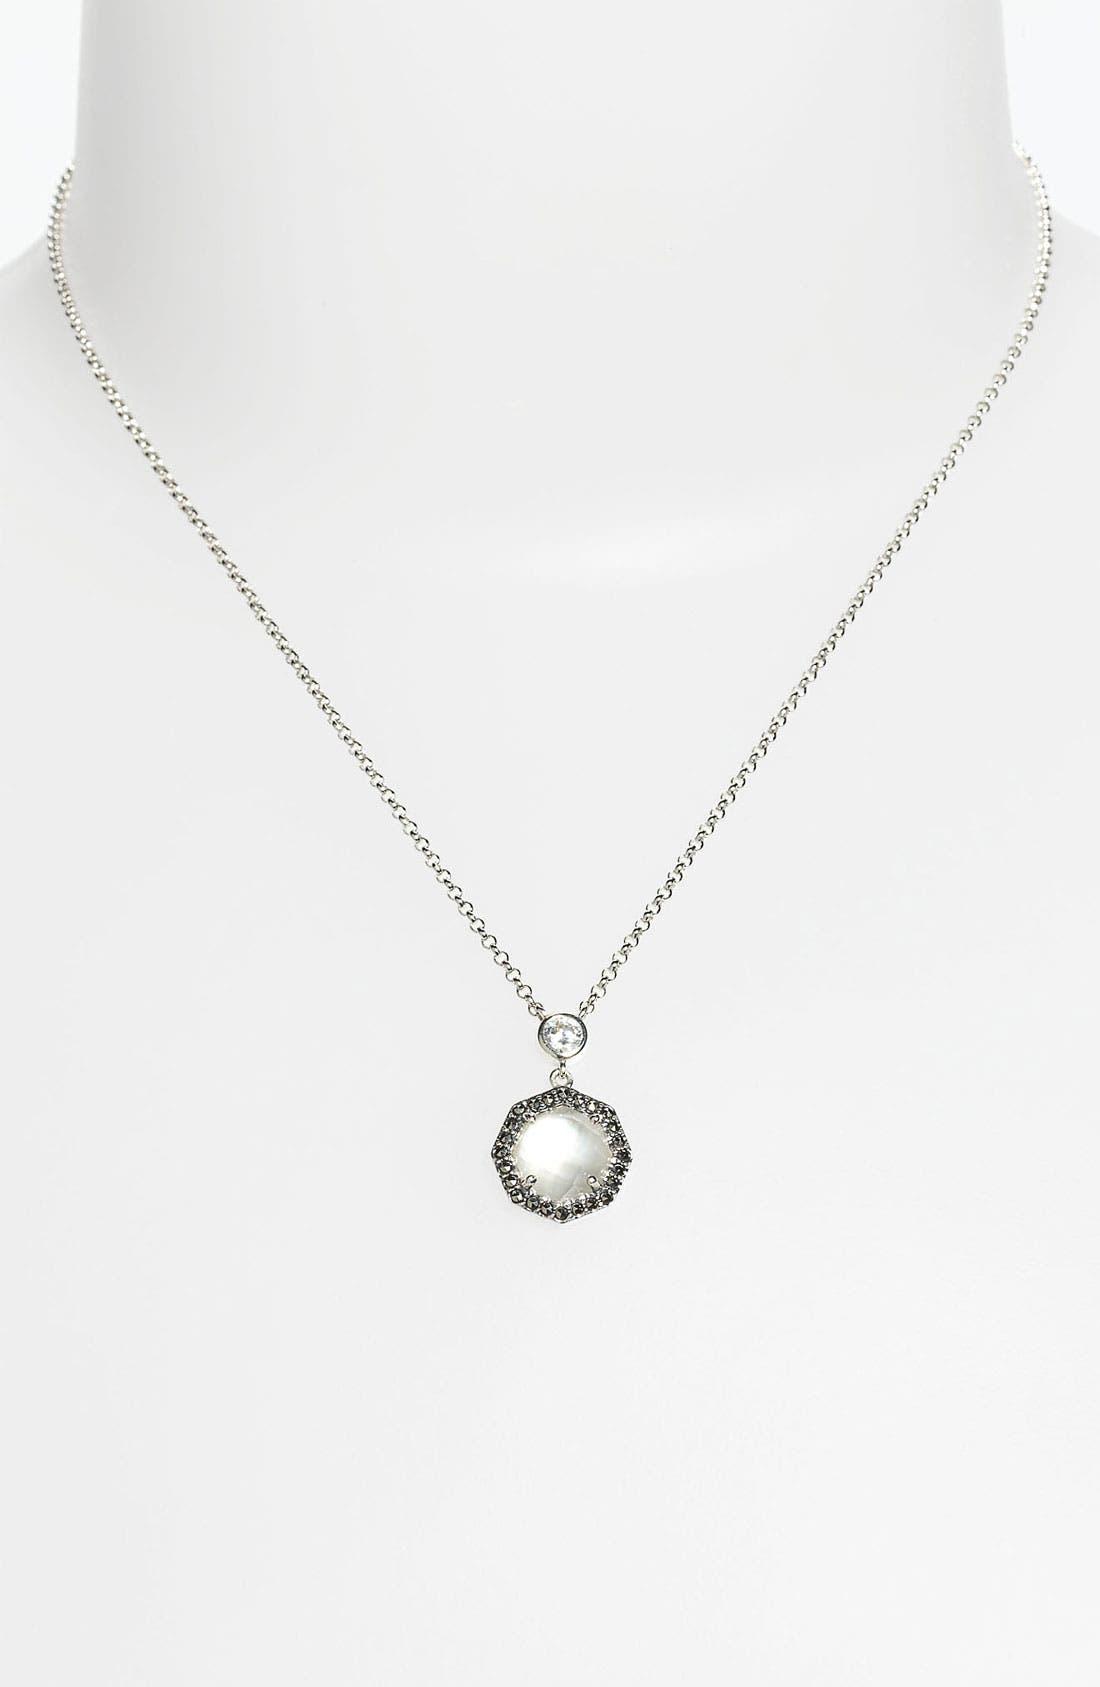 Alternate Image 1 Selected - Judith Jack 'Maldives' Small Round Pendant Necklace